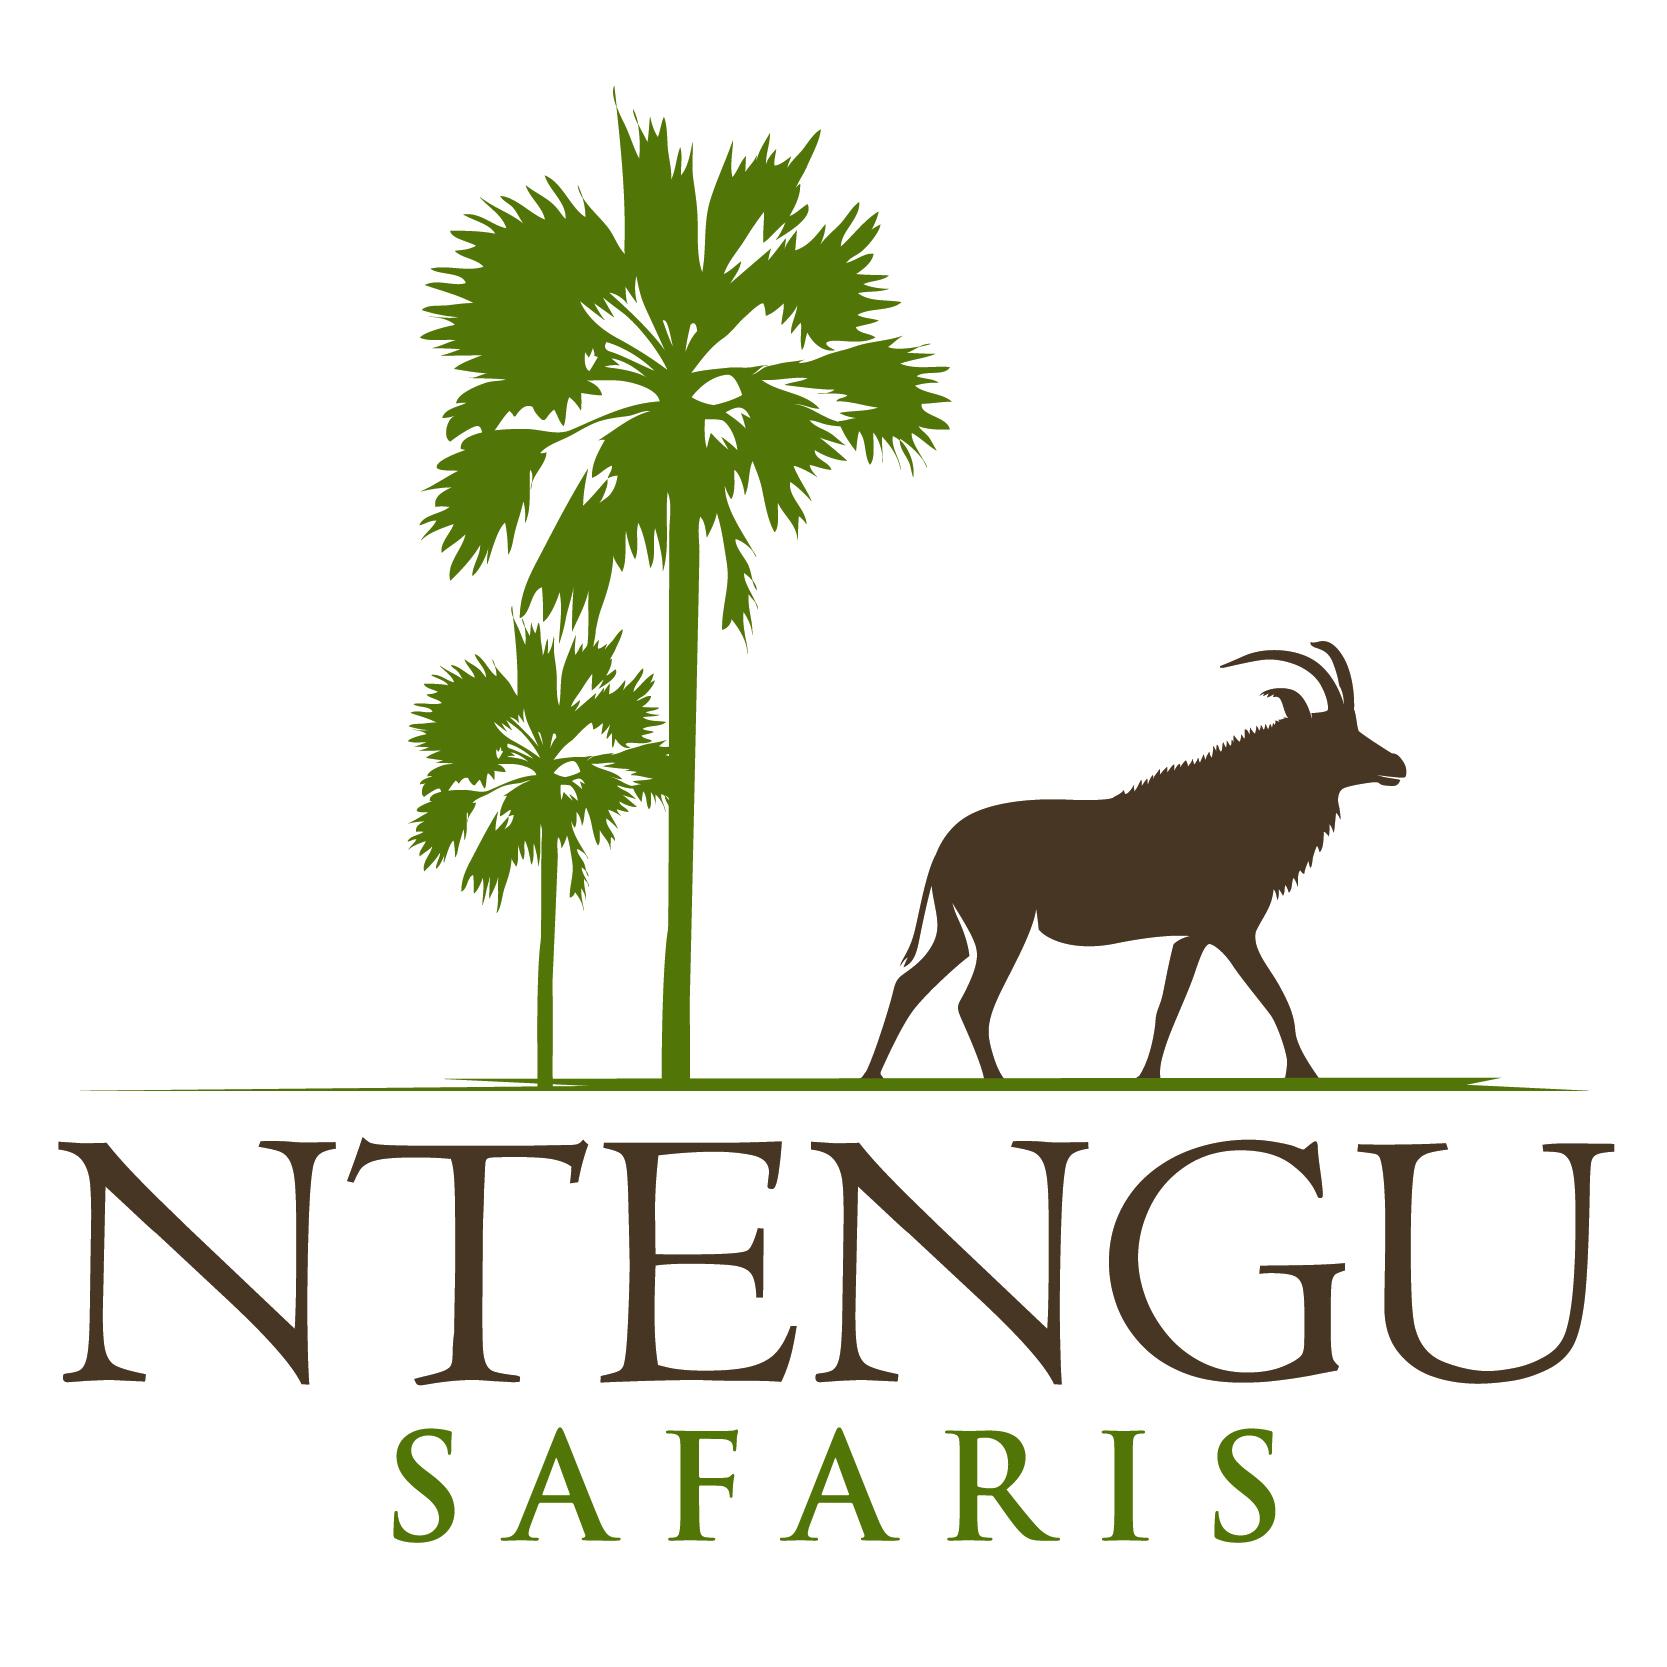 Ntengu Safaris_Final_28072017_RGB-01.jpg